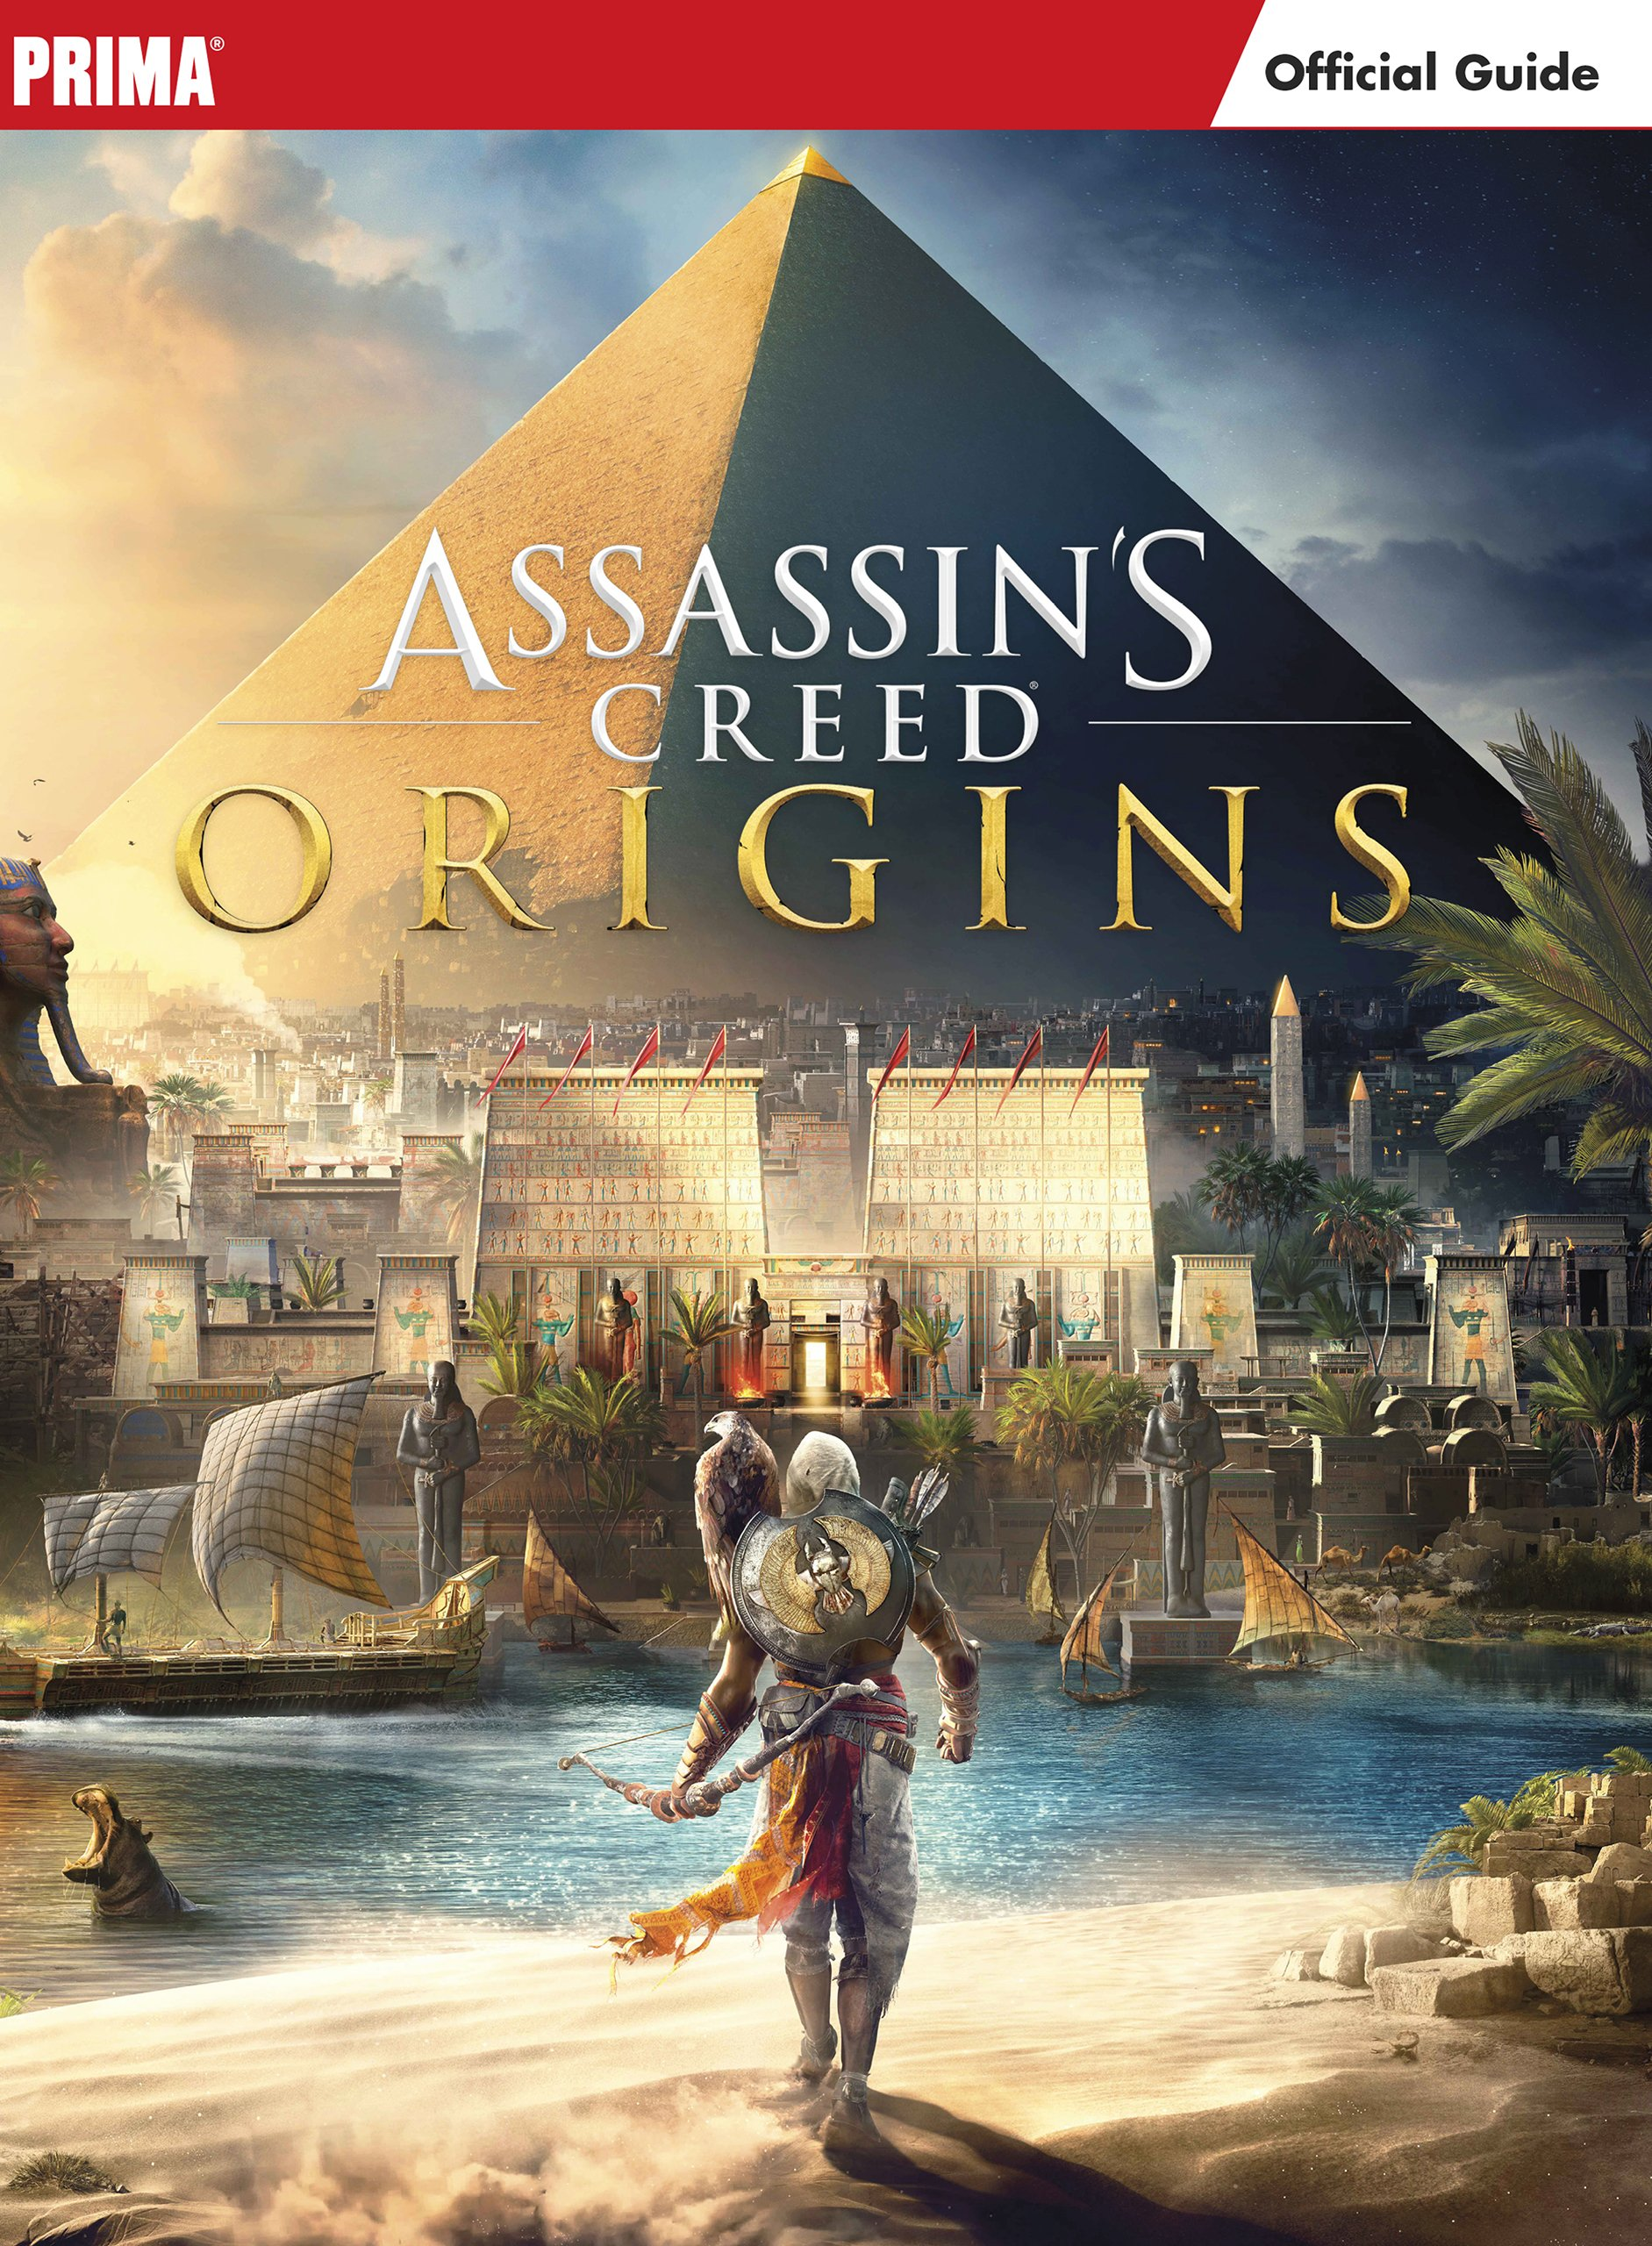 Assassins Creed Origins Official Game Guide